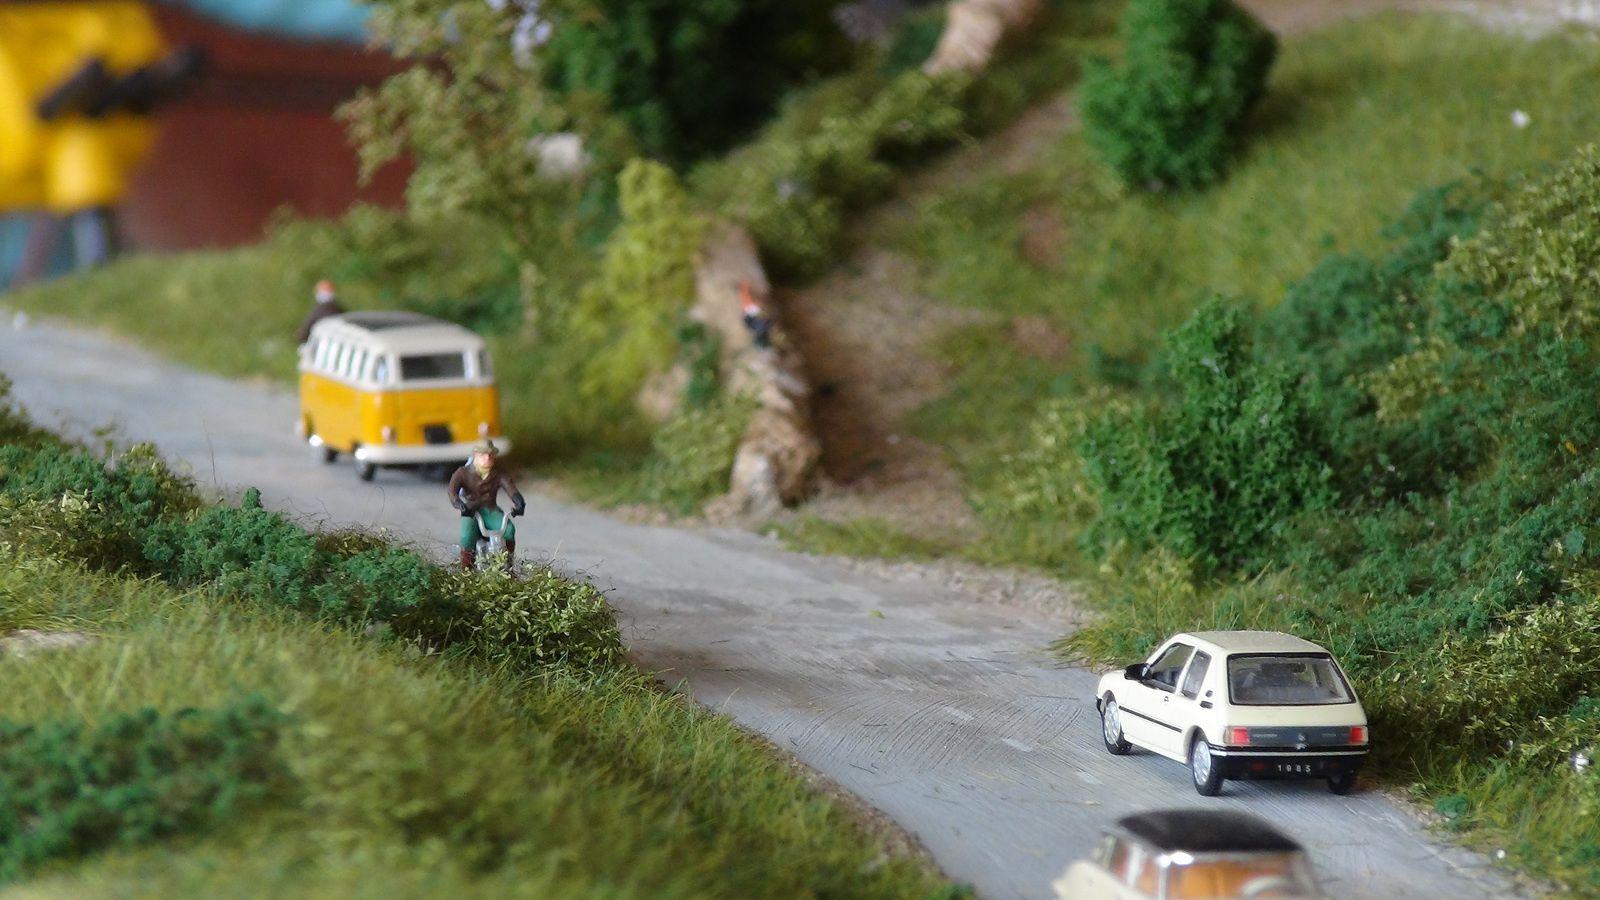 Petit coin de campagne - Mini World Lyon